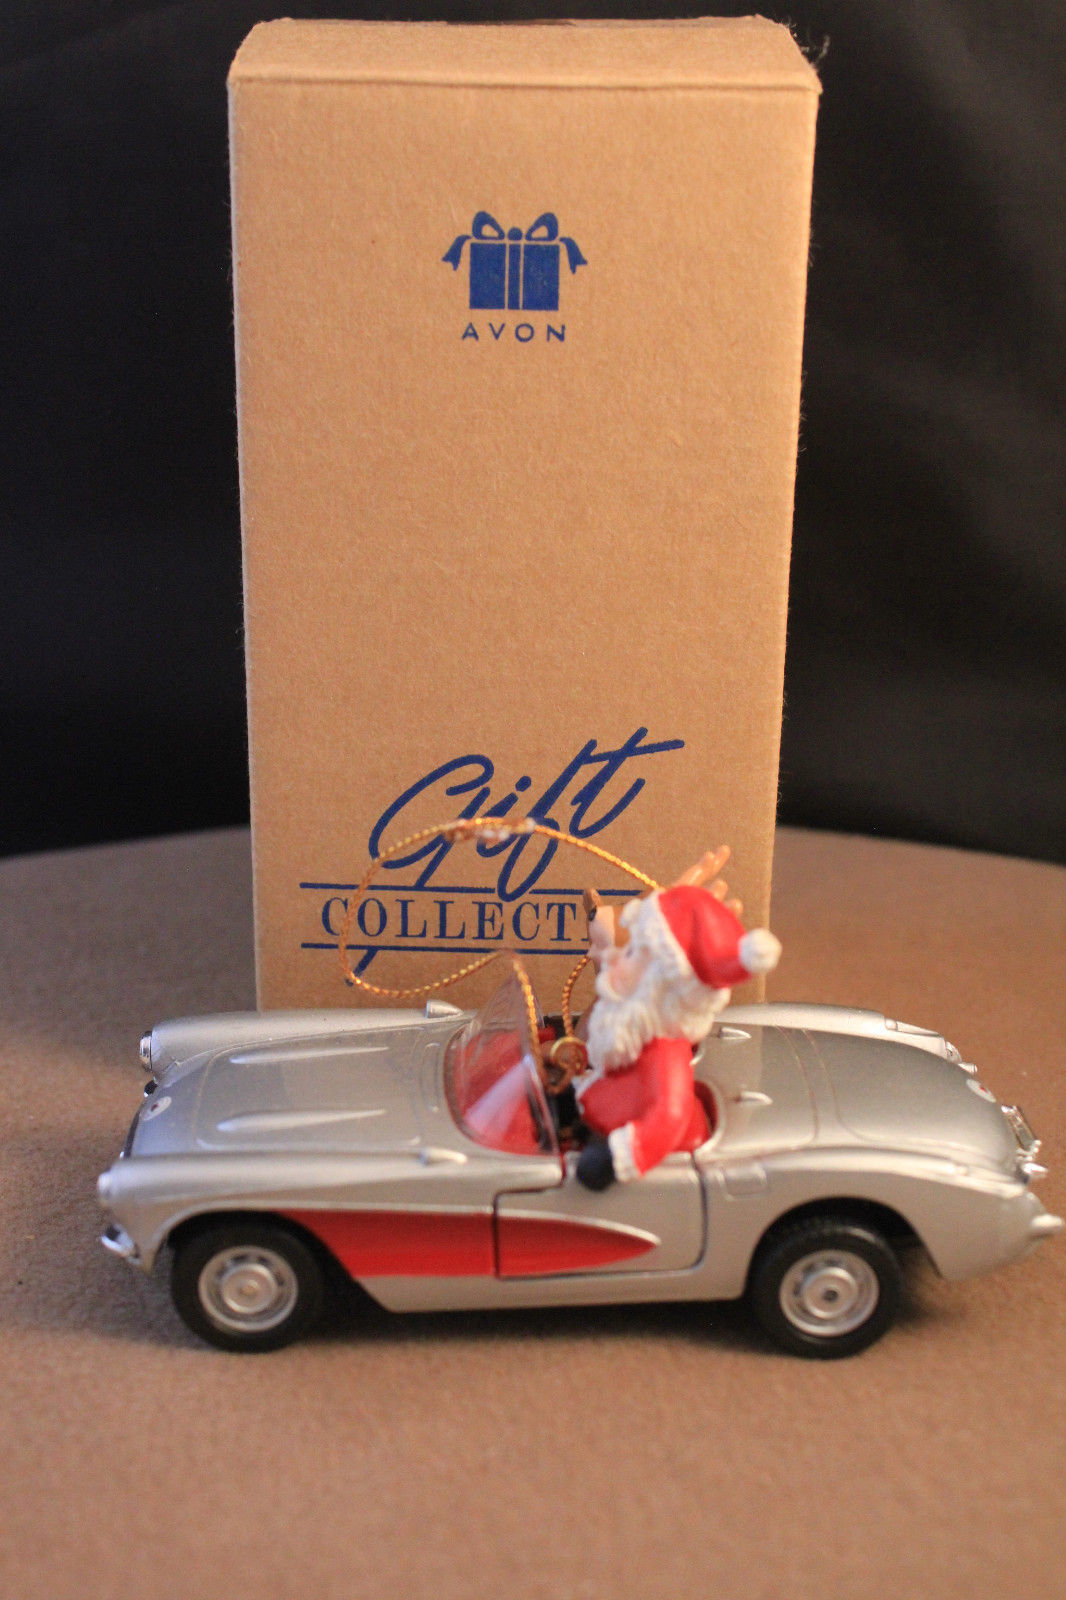 Avon 2001 Gift Collection Maisto Santa in '57 Corvette Christmas Ornament 1/39